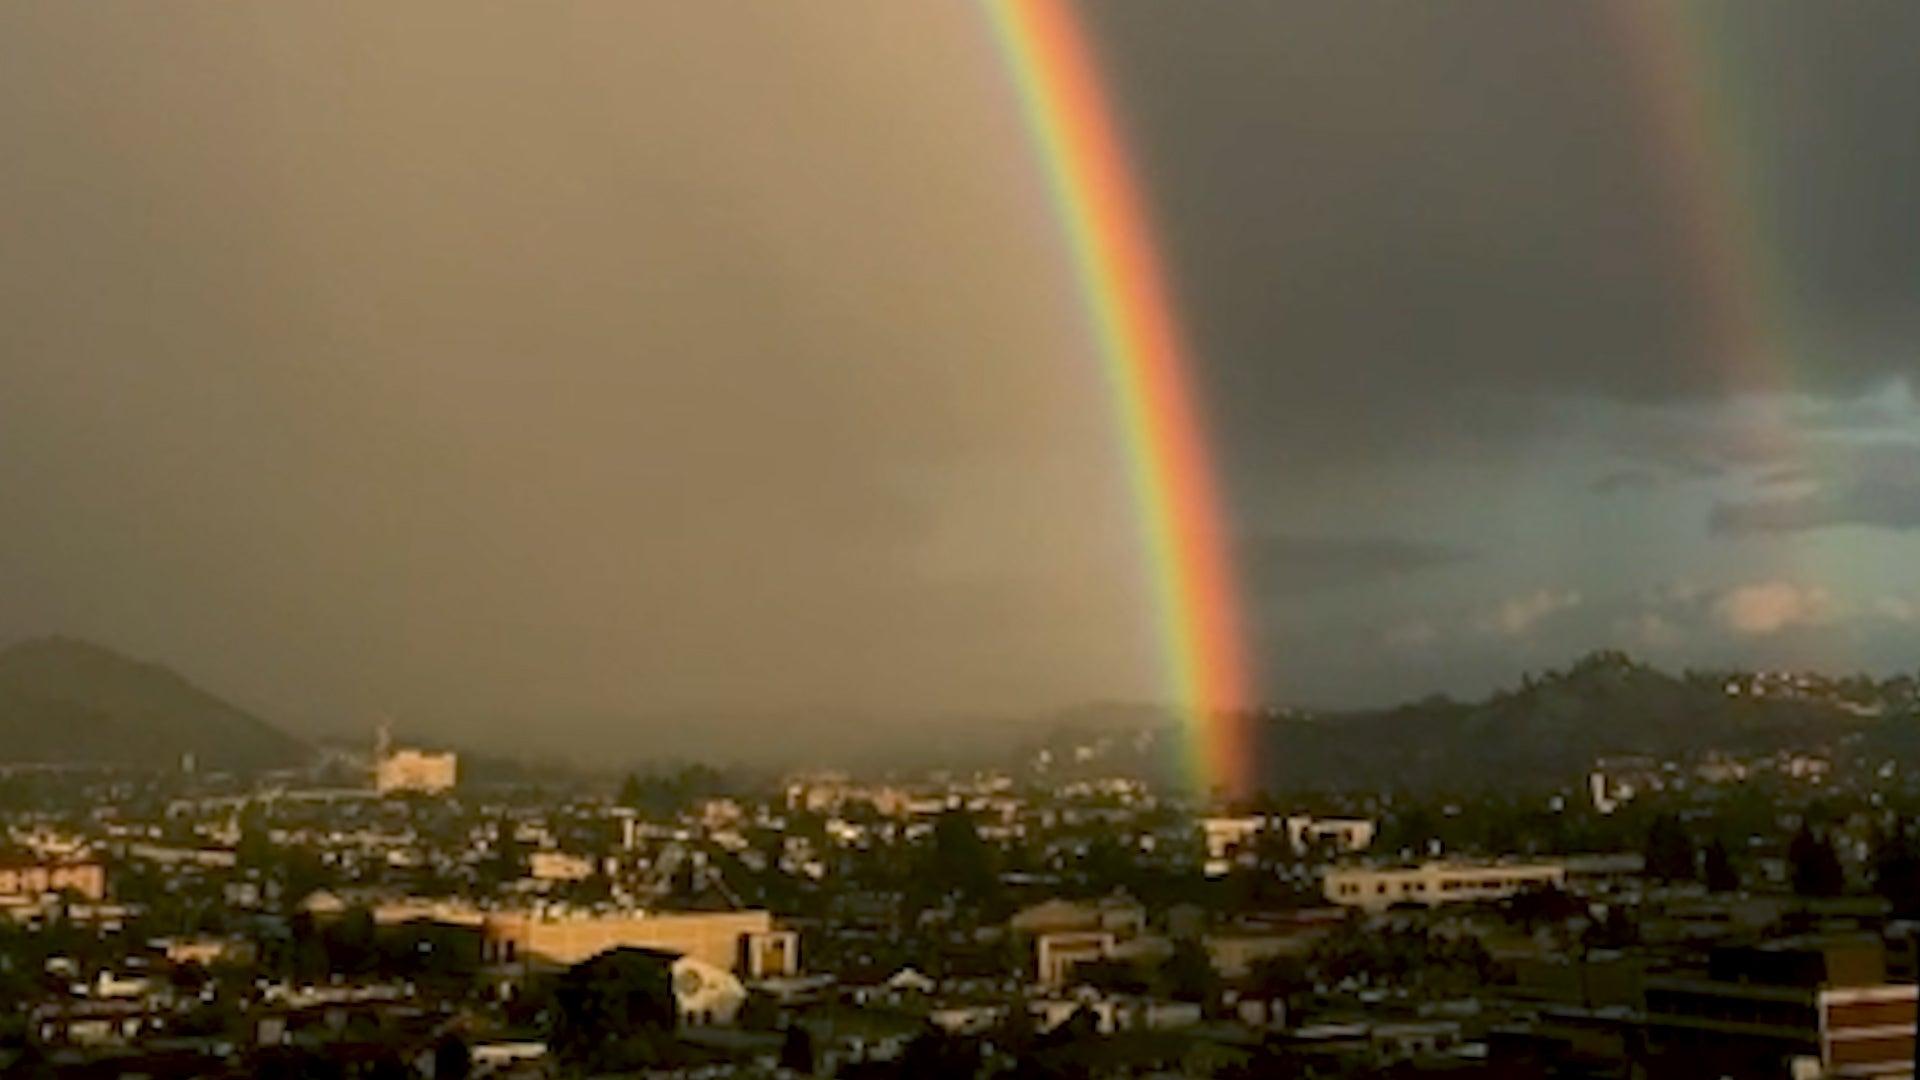 Los Angeles Experiences Incredible Double Rainbow